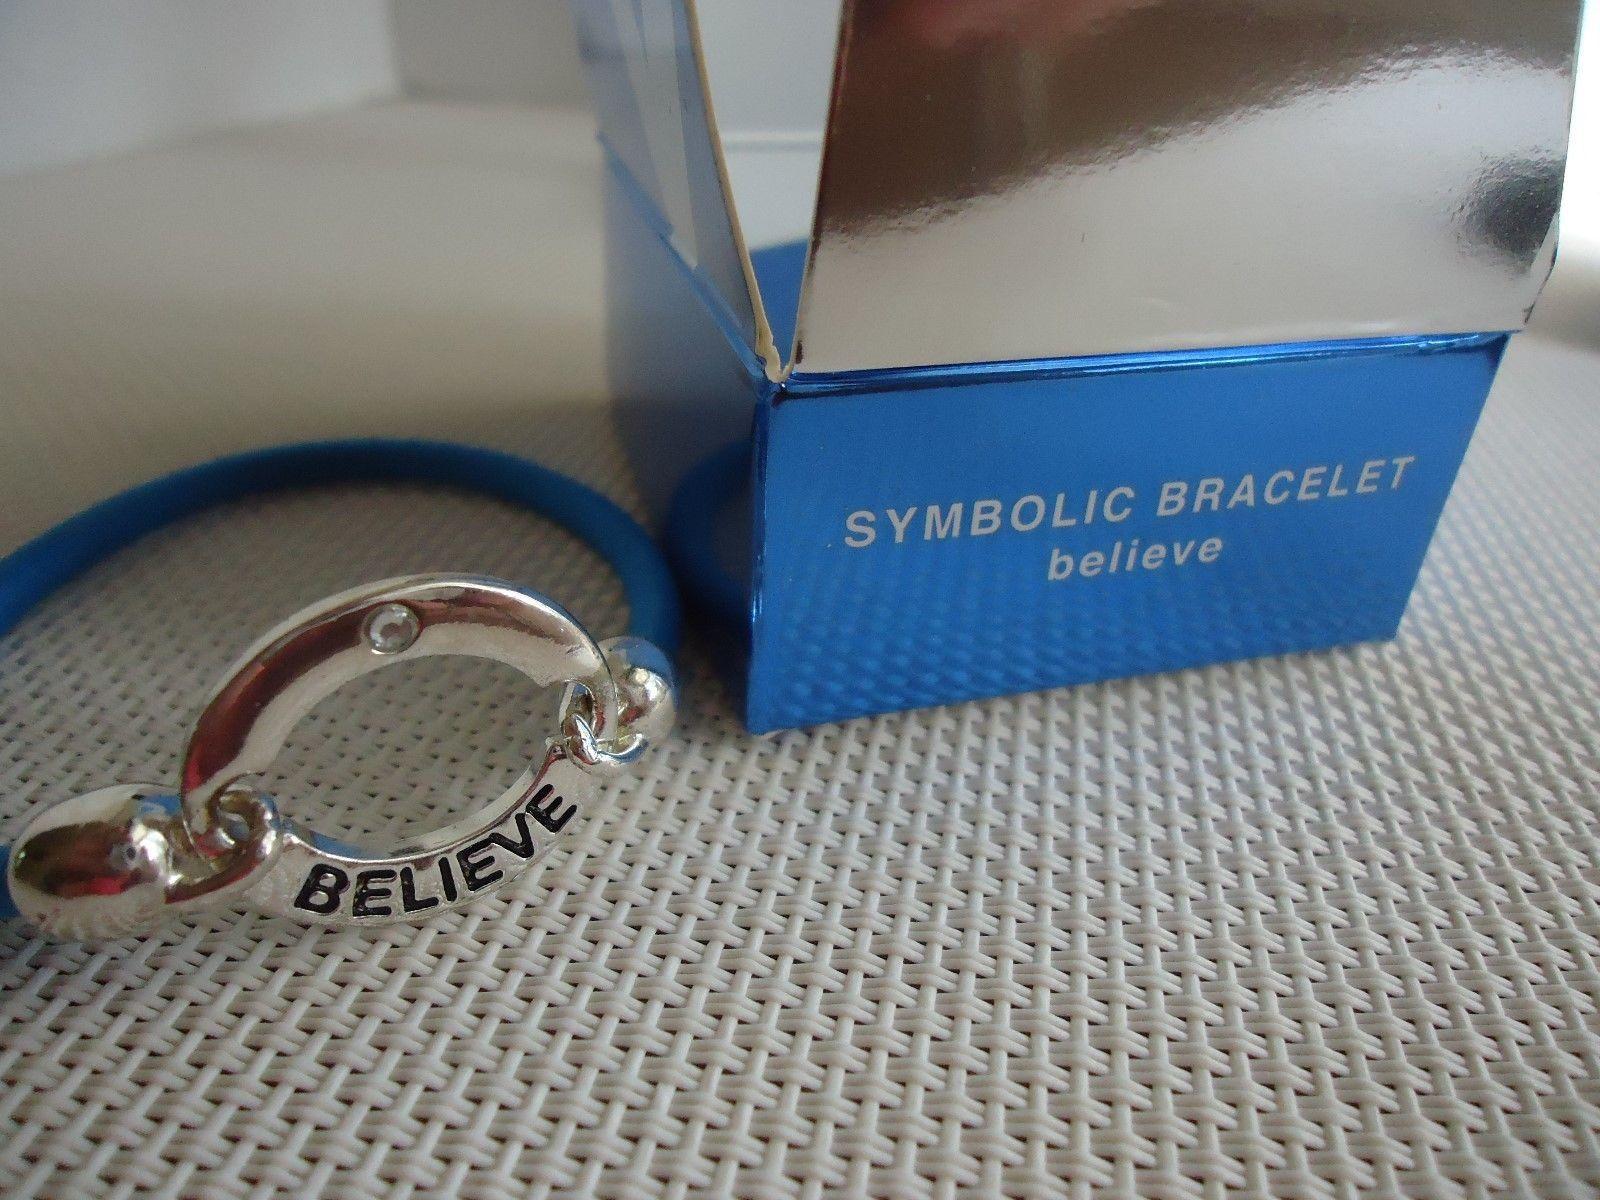 Lot of (3) Symbolic Bracelets Love Believe Succeed